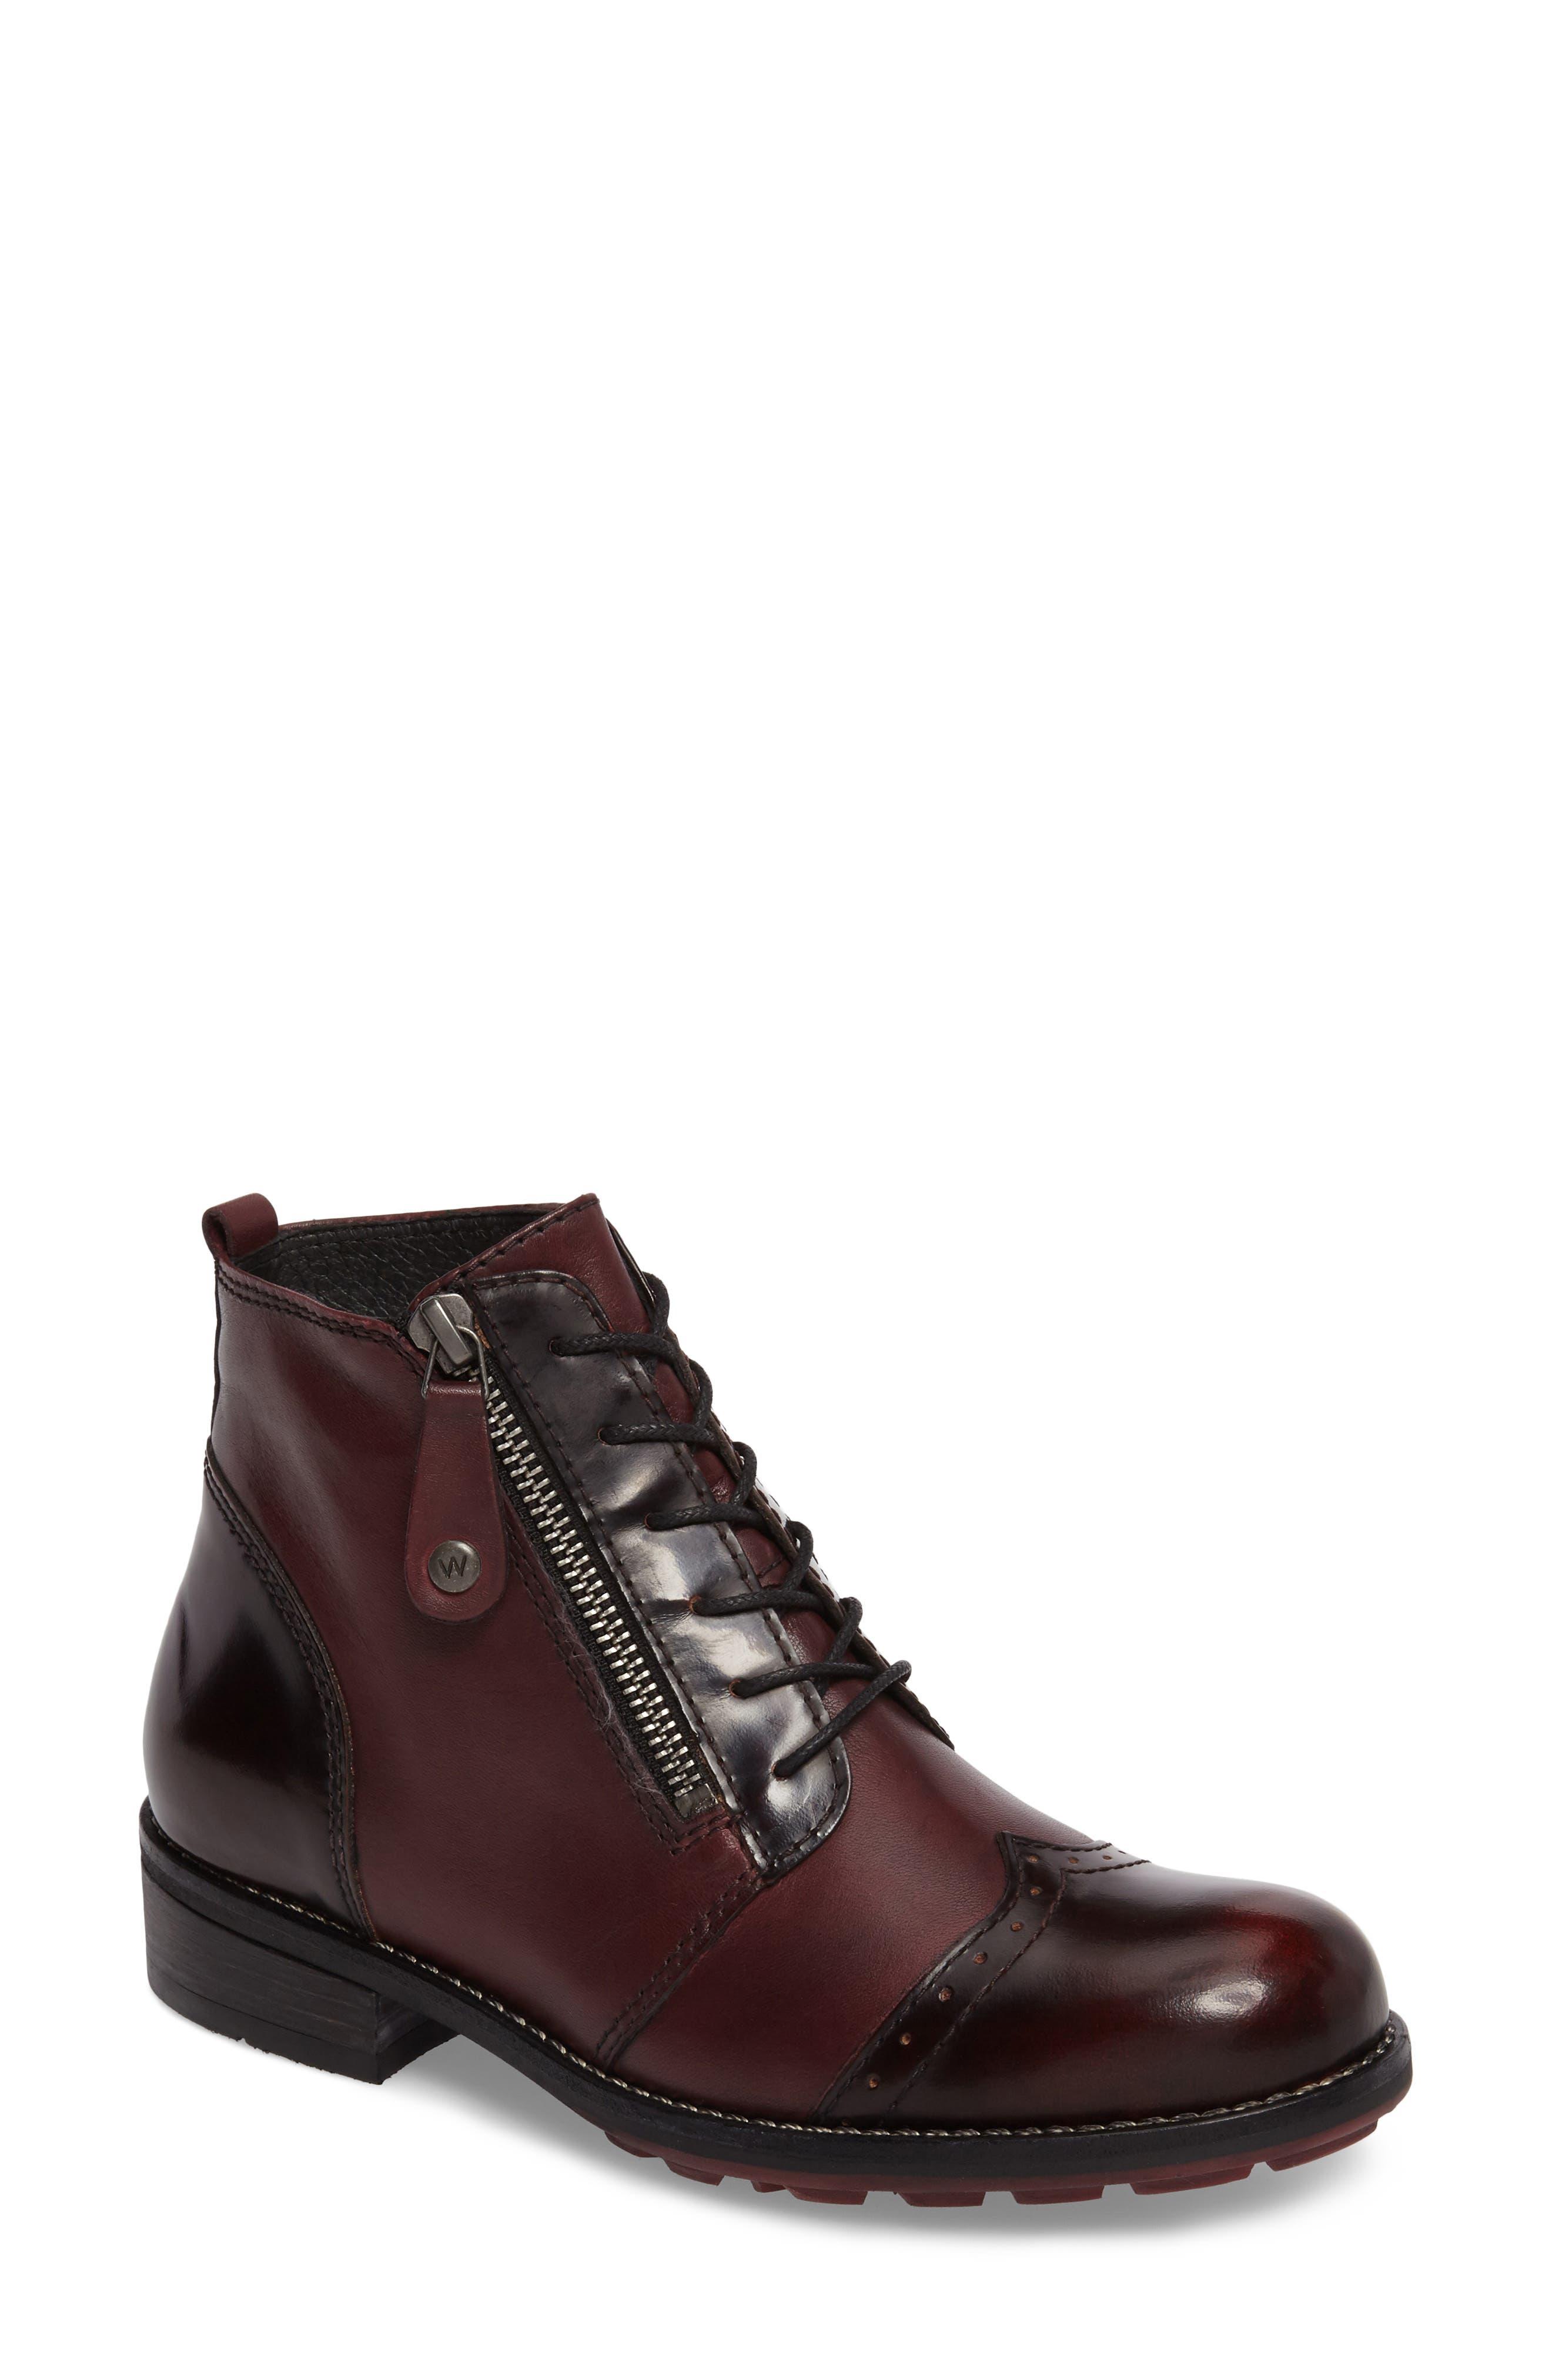 Millstream Boot,                             Main thumbnail 1, color,                             Bordo Leather